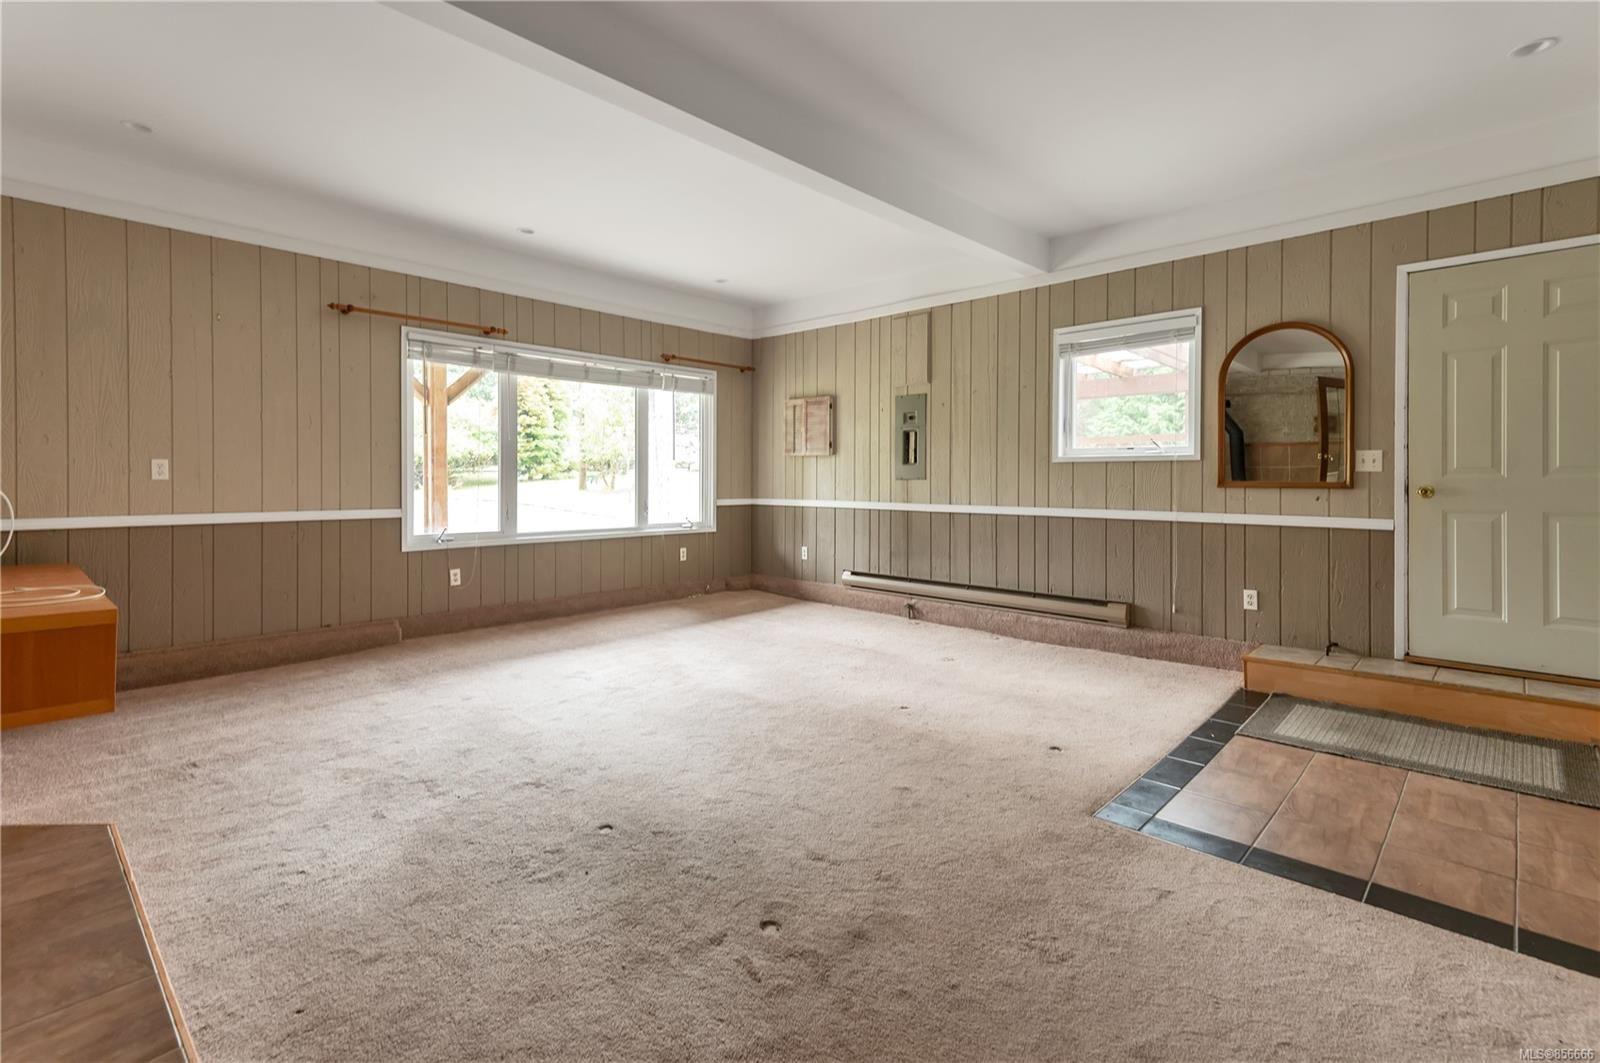 Photo 22: Photos: 2468 Oakes Rd in : CV Merville Black Creek House for sale (Comox Valley)  : MLS®# 856666